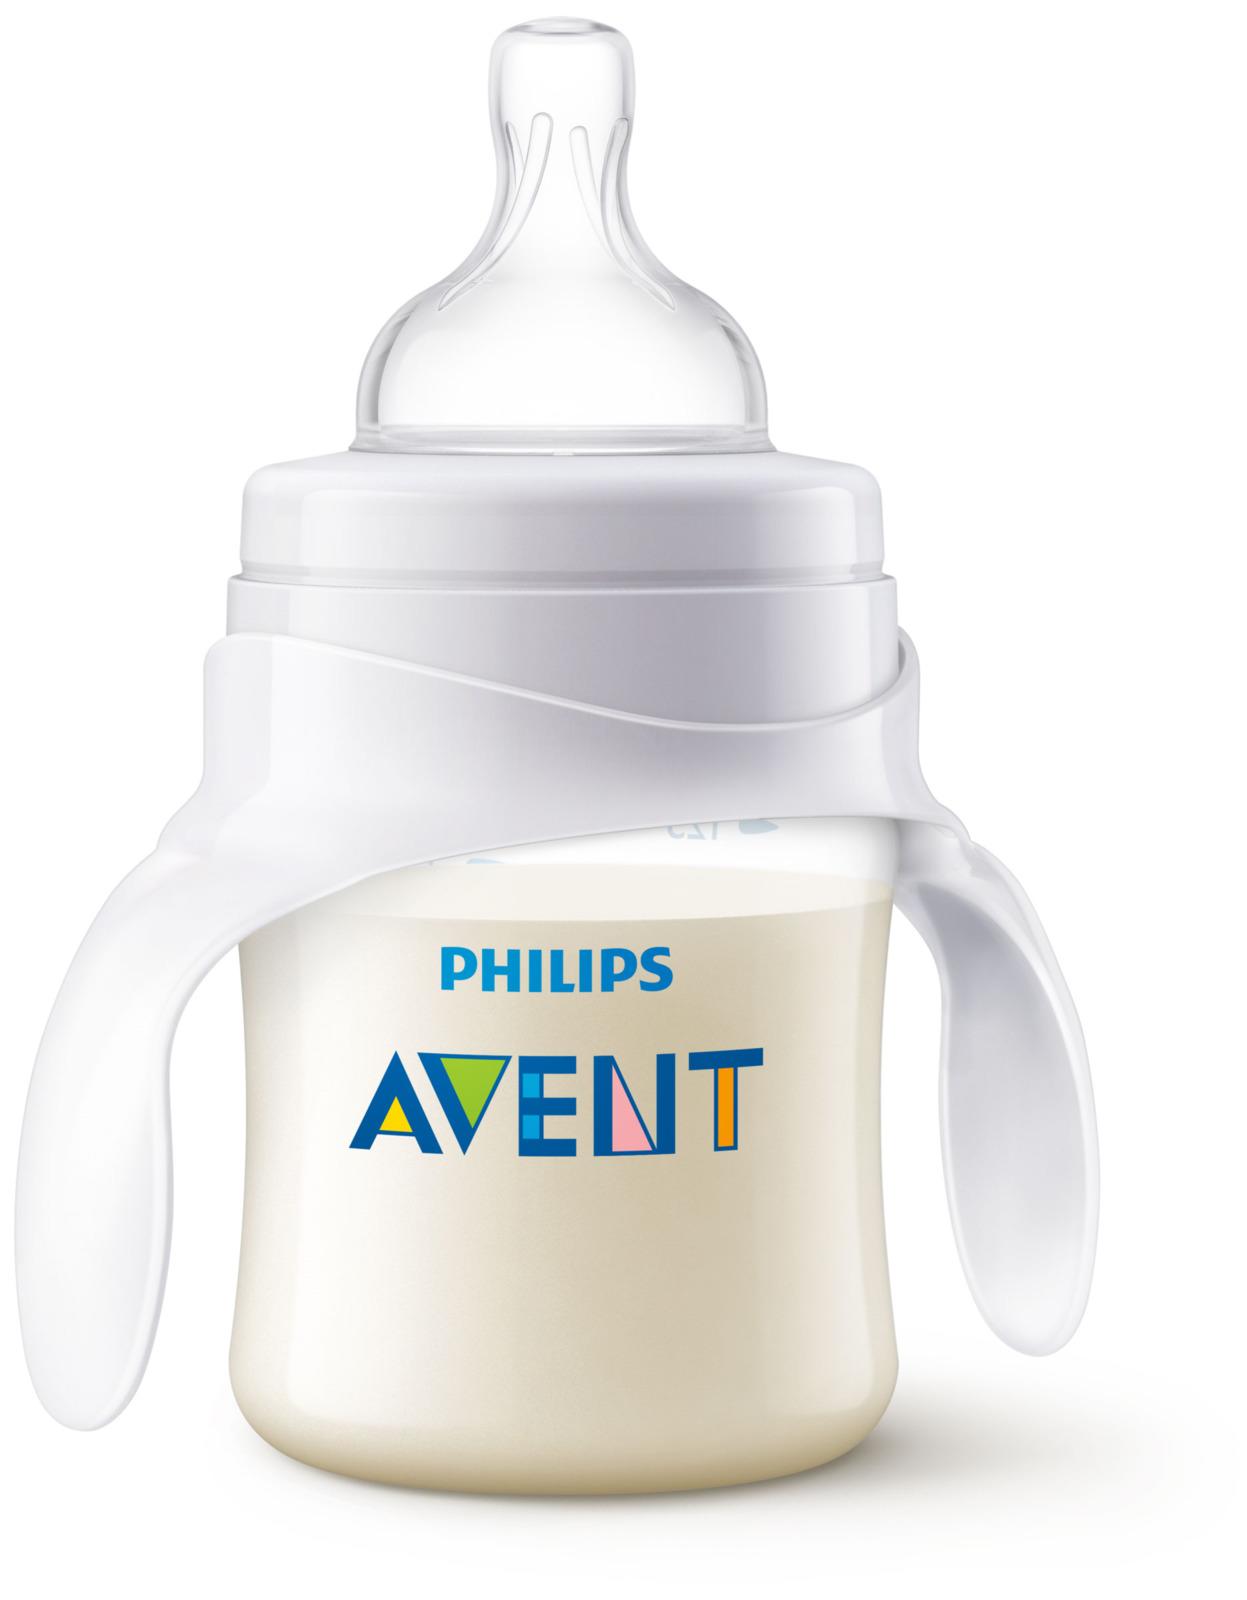 Бутылочка для кормления Philips Avent, от 4 месяцев, SCF638/01, 120 мл mp3 плеер nexx